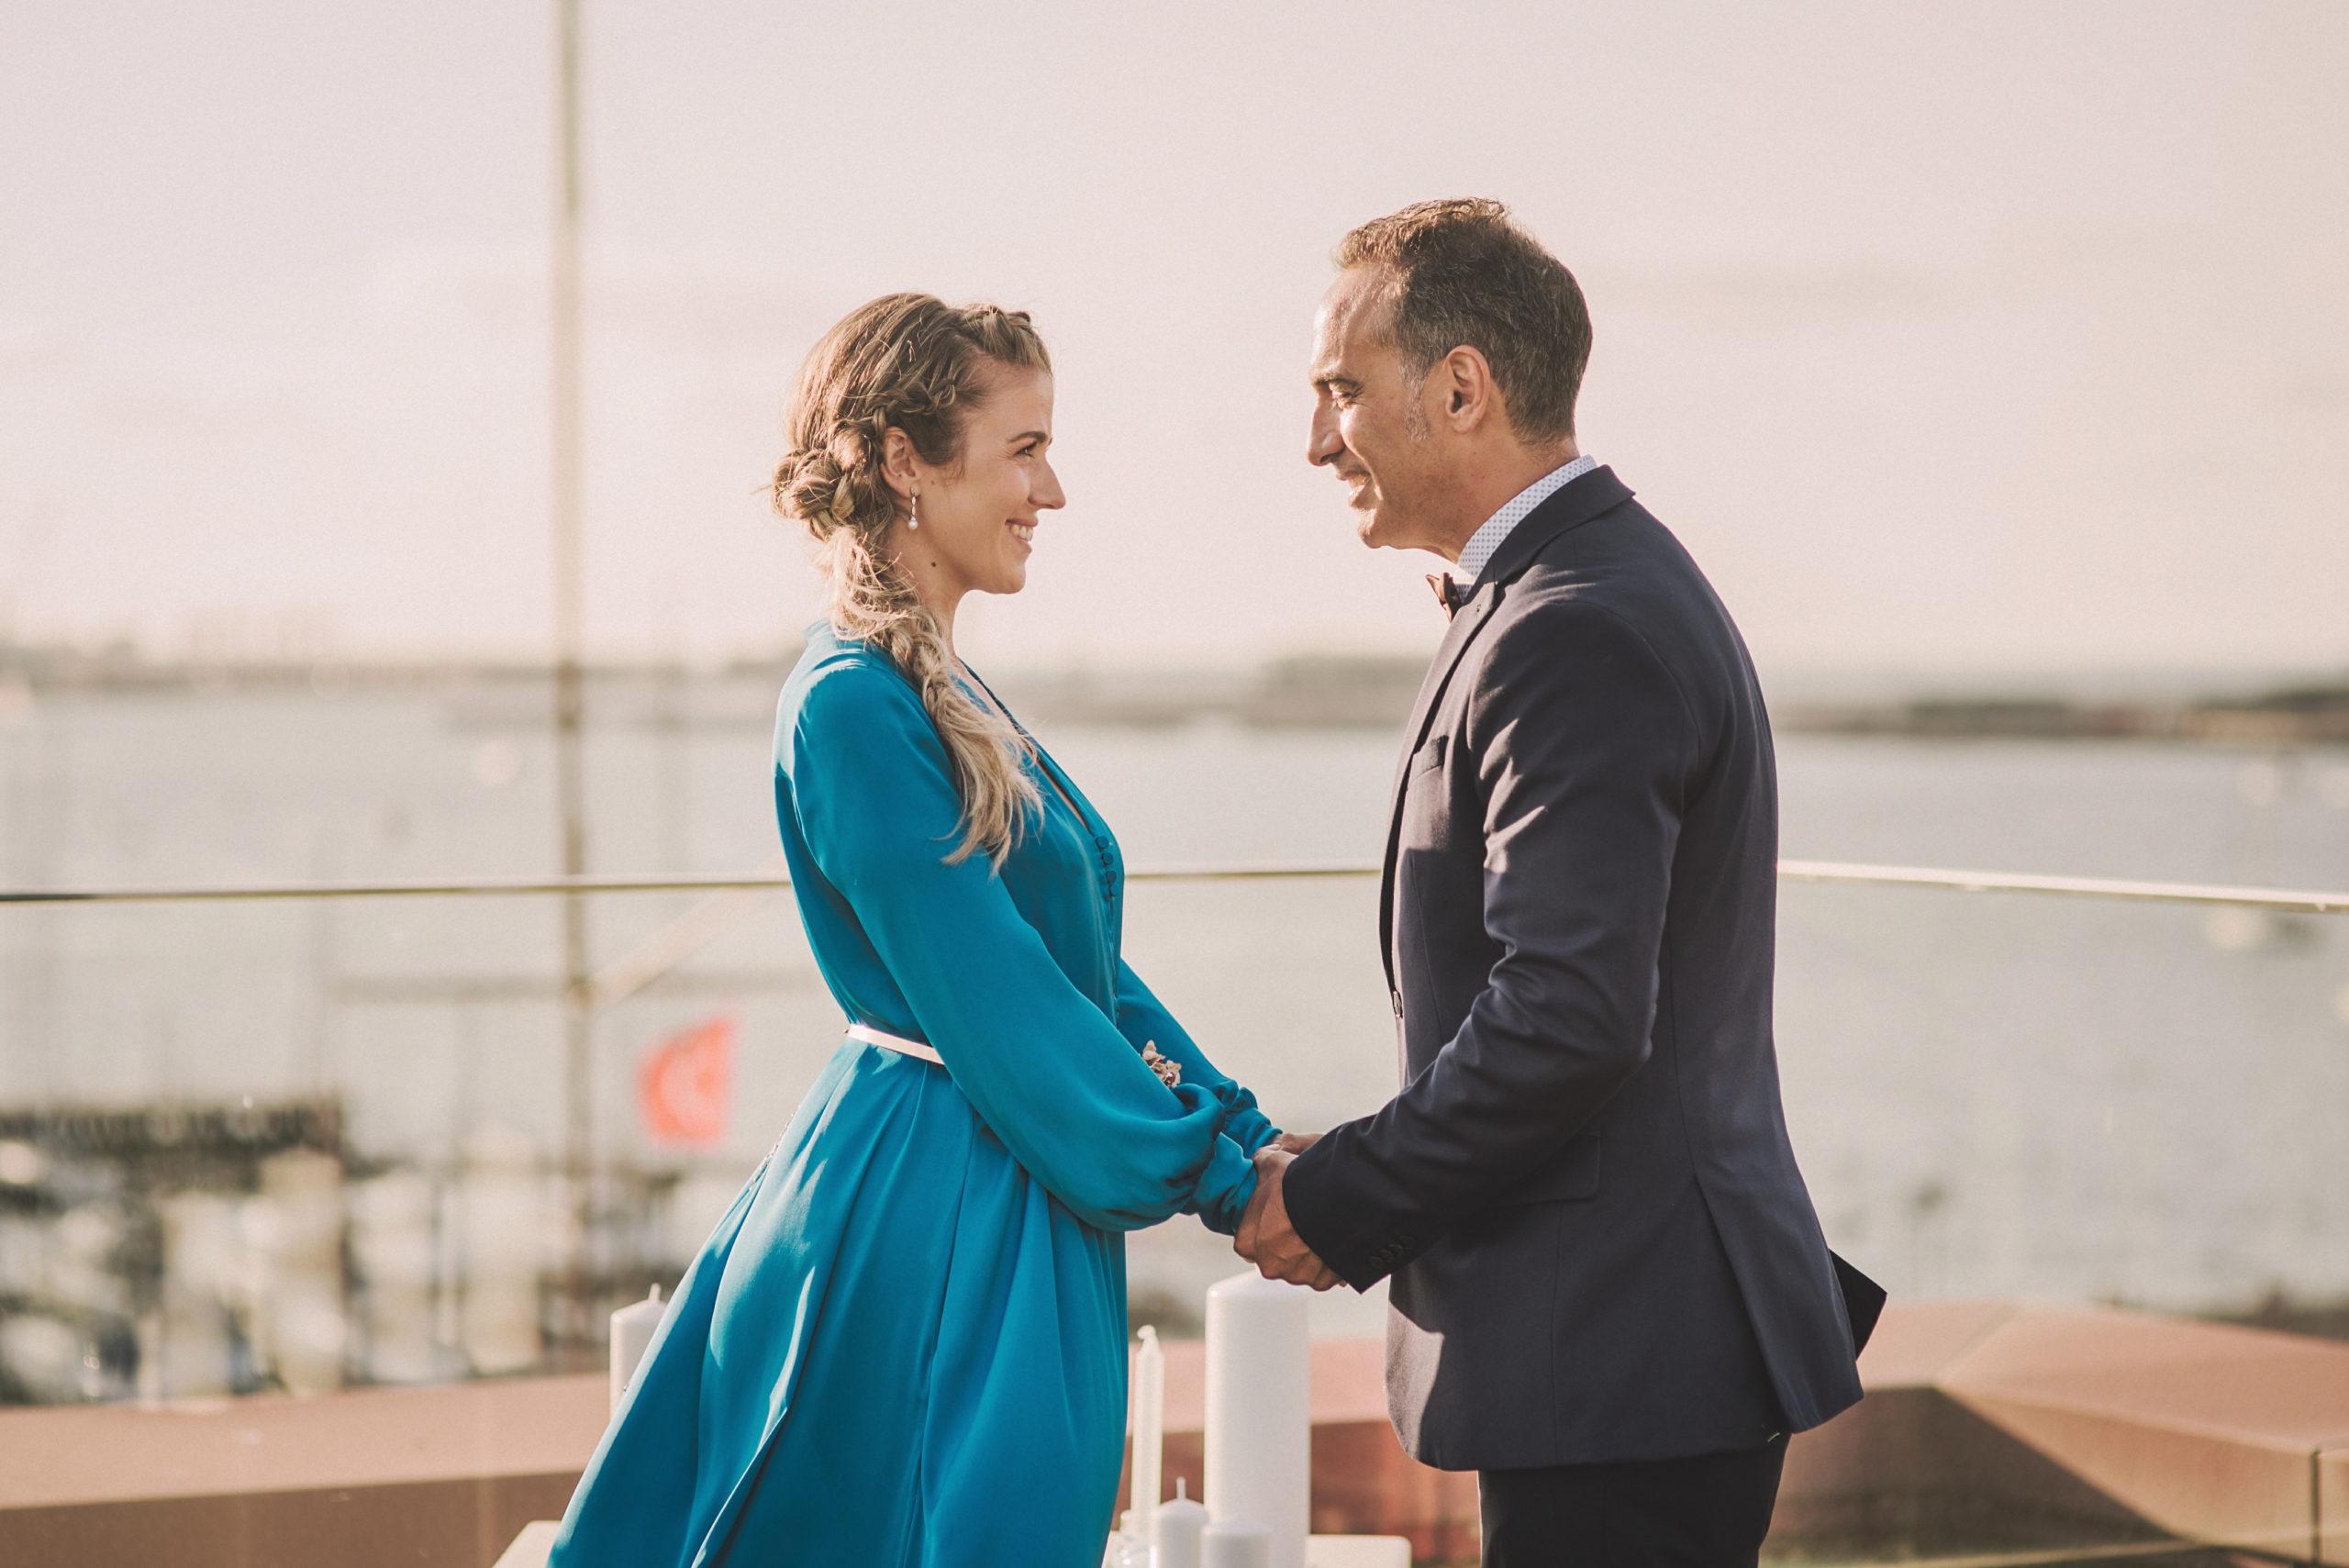 Novia y novio momento pedida de mano frente al mar